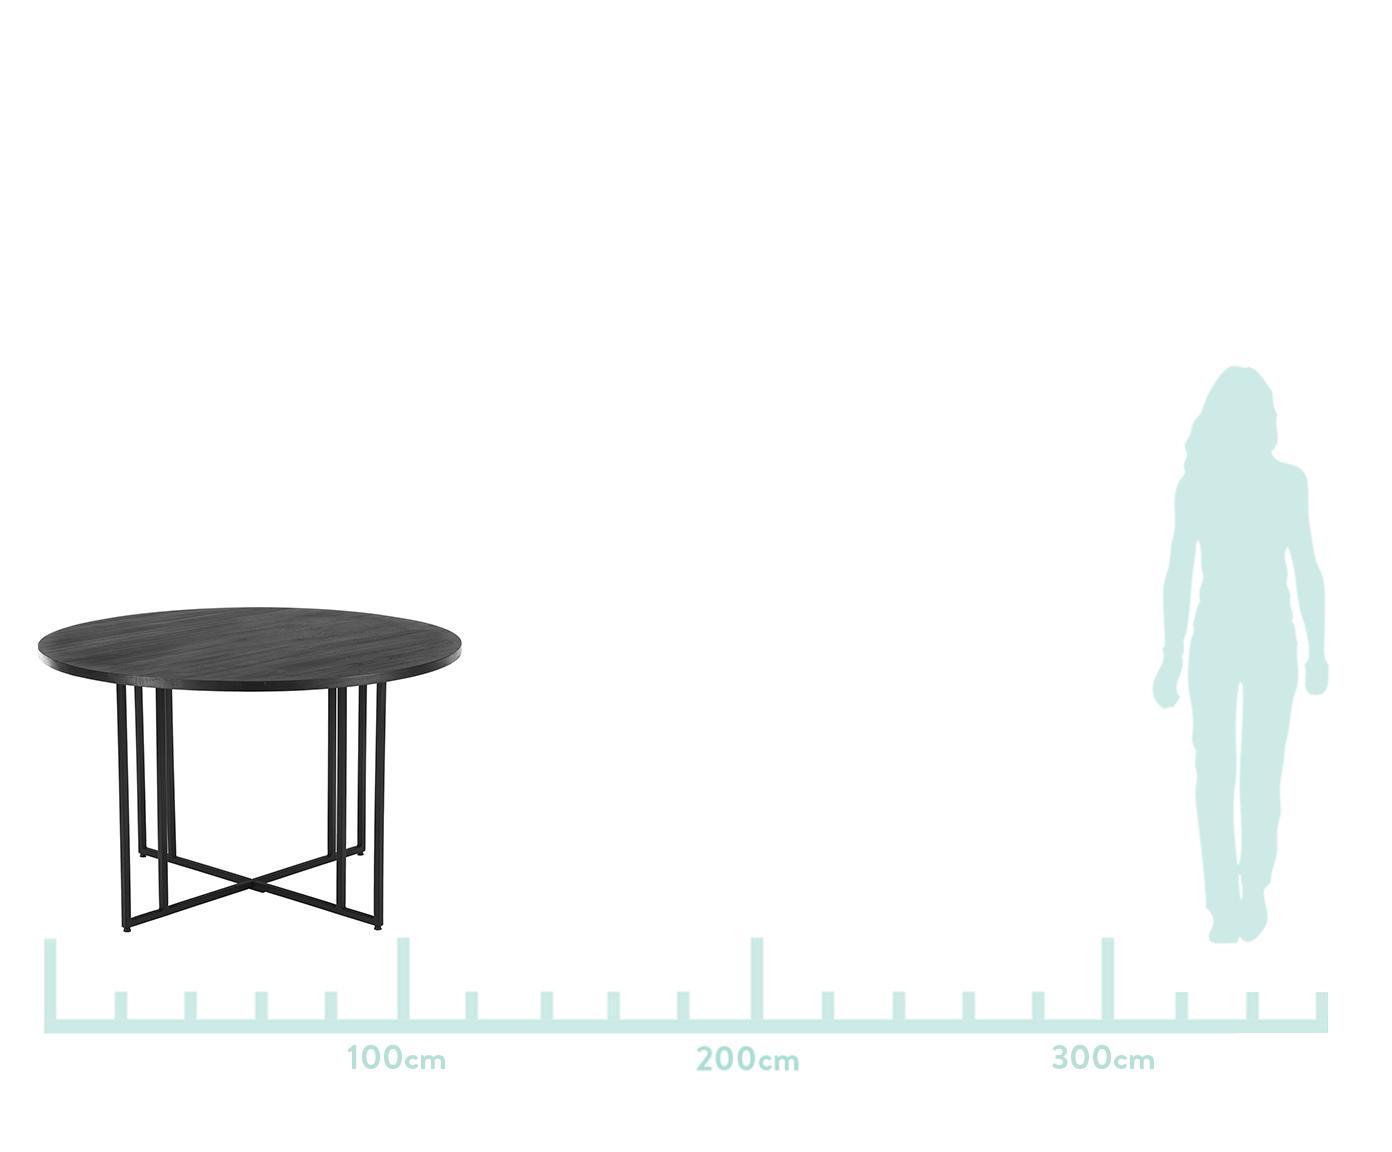 Runder Massivholz Esstisch Luca in Schwarz, Tischplatte: Massives Mangoholz, gebür, Gestell: Metall, pulverbeschichtet, Tischplatte: Mangoholz, schwarz lackiertGestell: Schwarz, matt, Ø 120 x H 75 cm